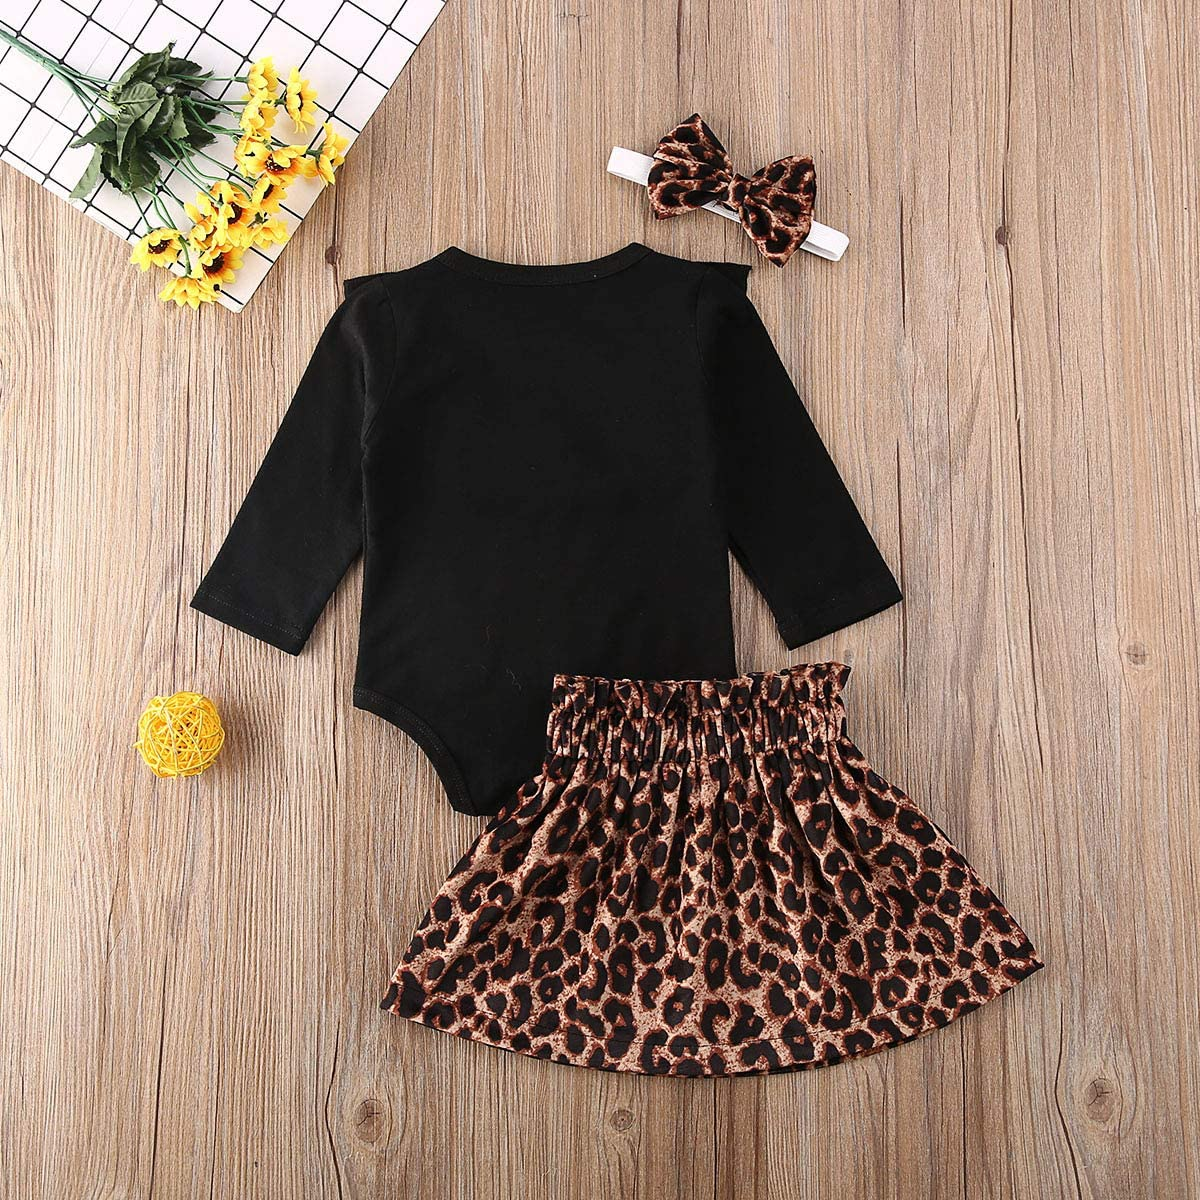 Tutu Skirt Newborn Baby Girls Leopard Outfit Ruffle Long Sleeve Bodysuit Headband Princess Dress Set of 3